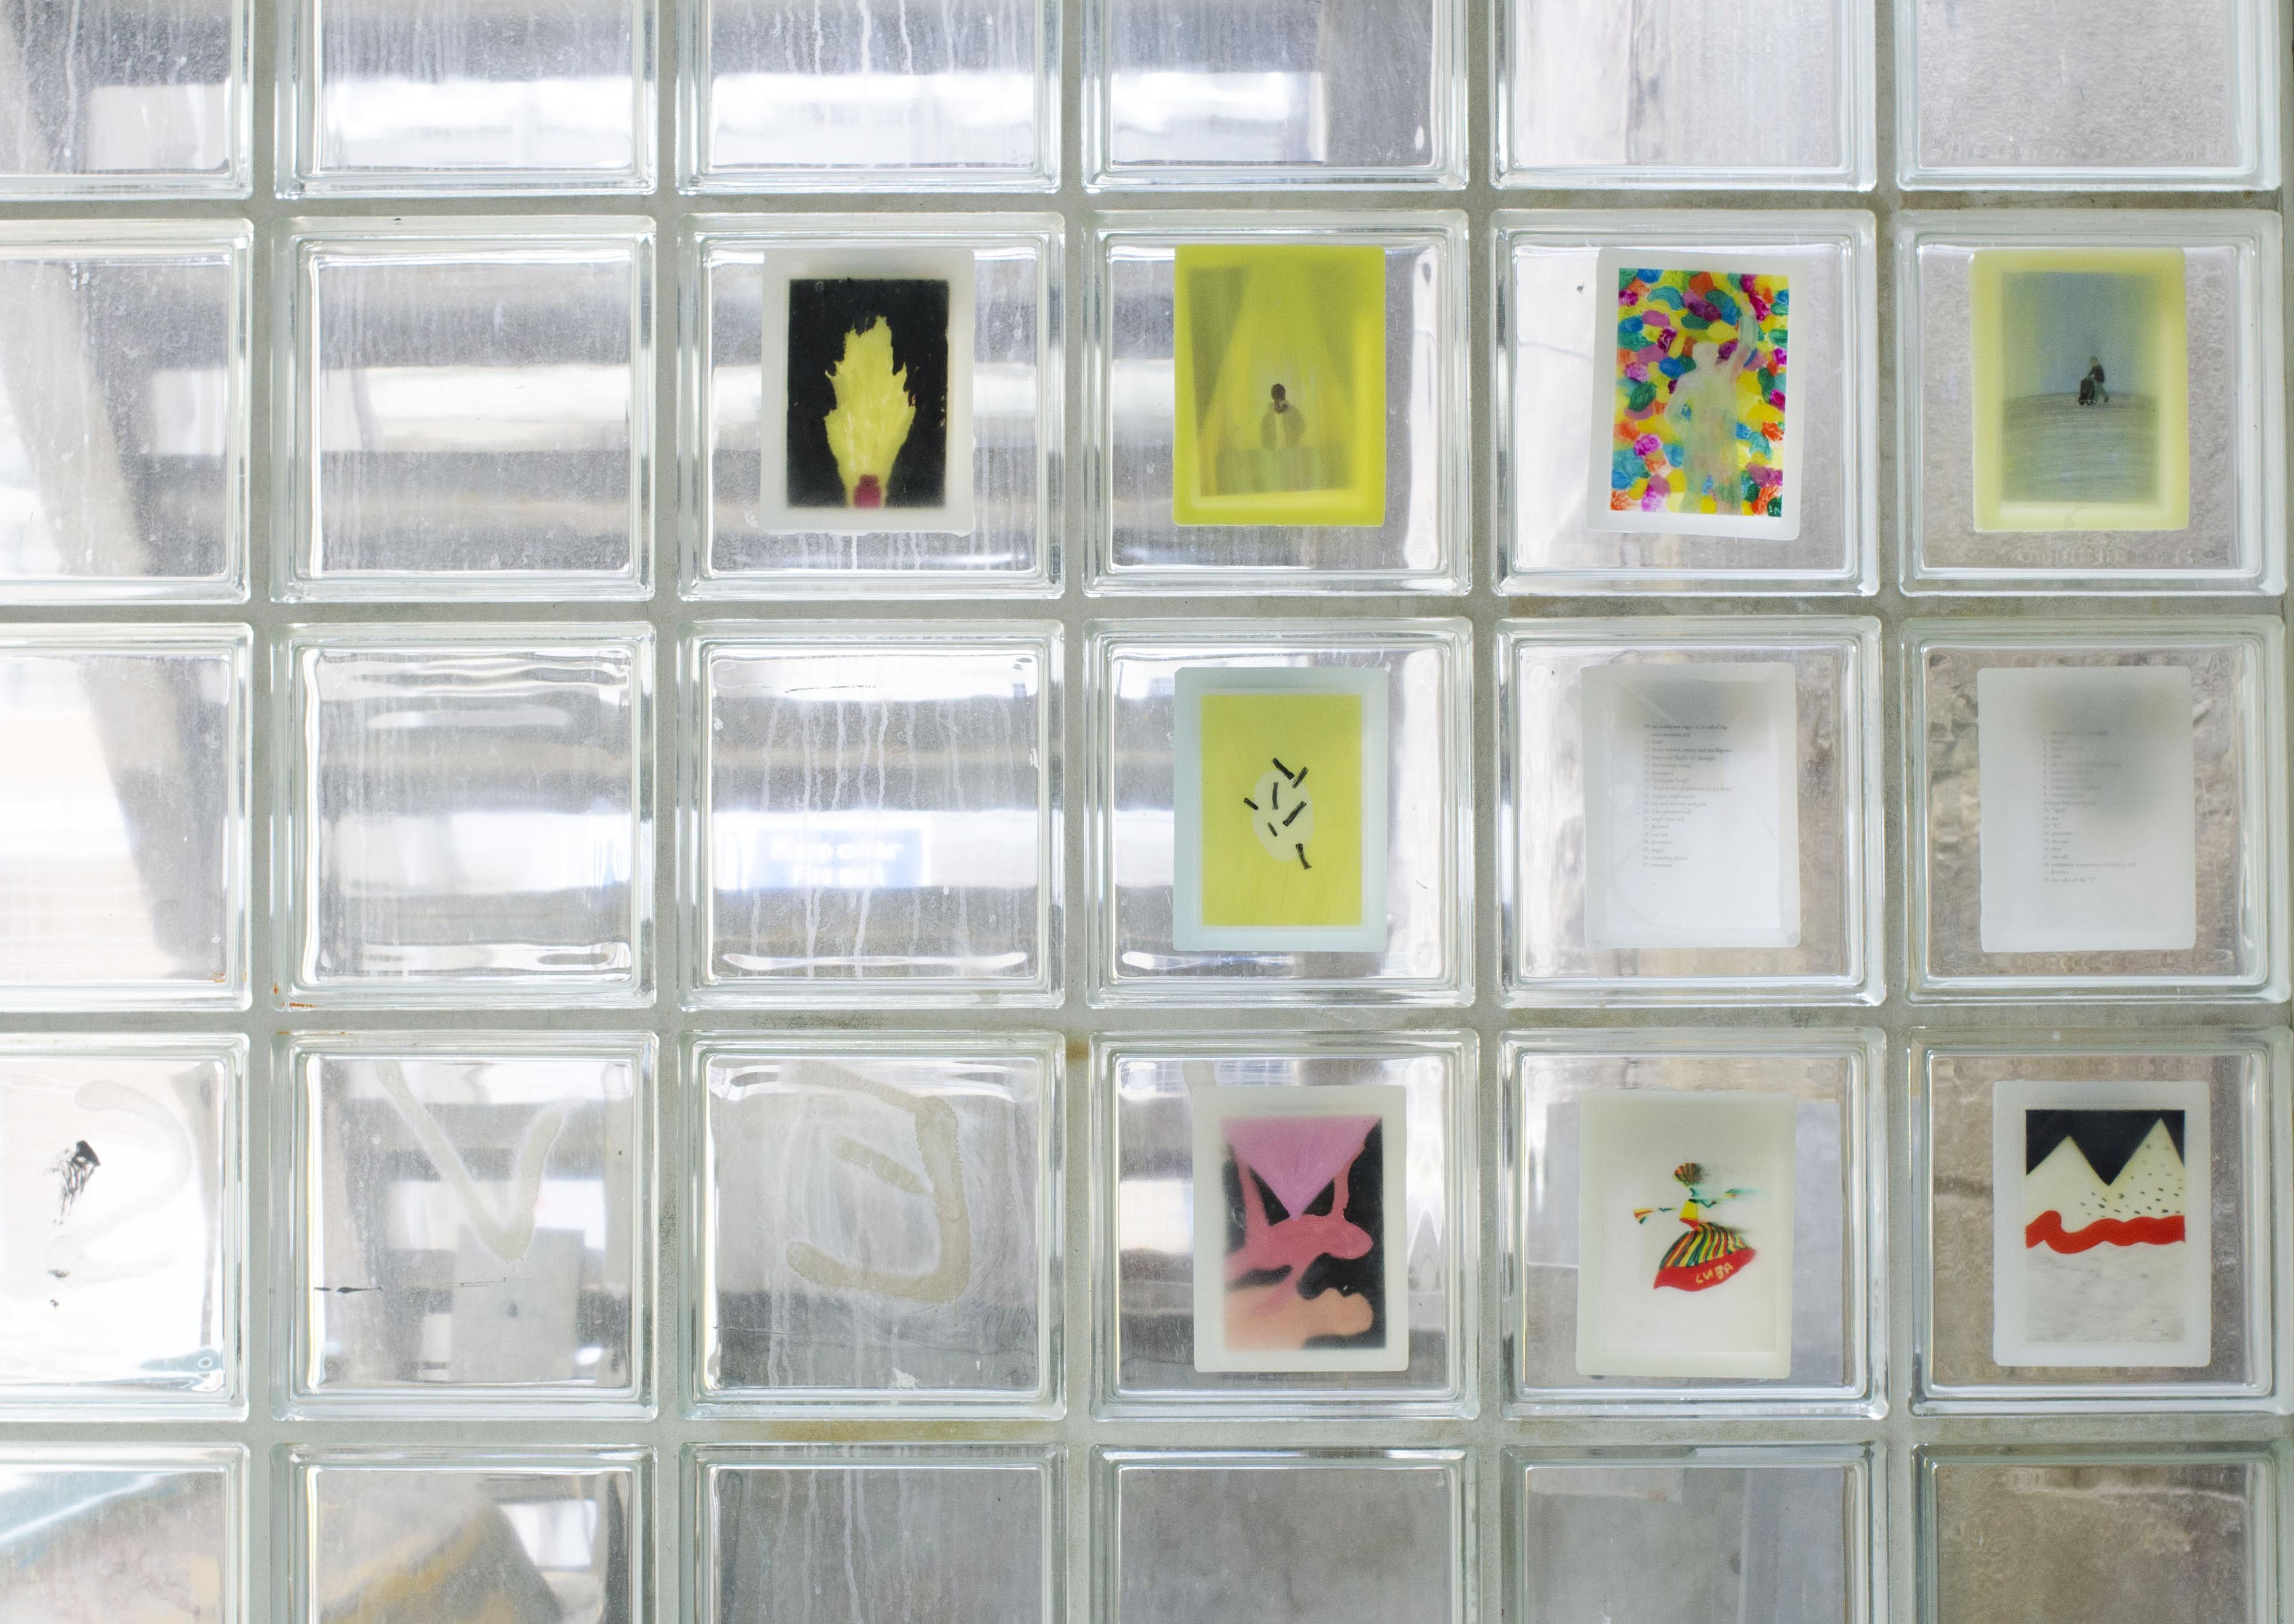 © Ahae Kim, wax series installation view, Slade Graduate Degree show, 2018